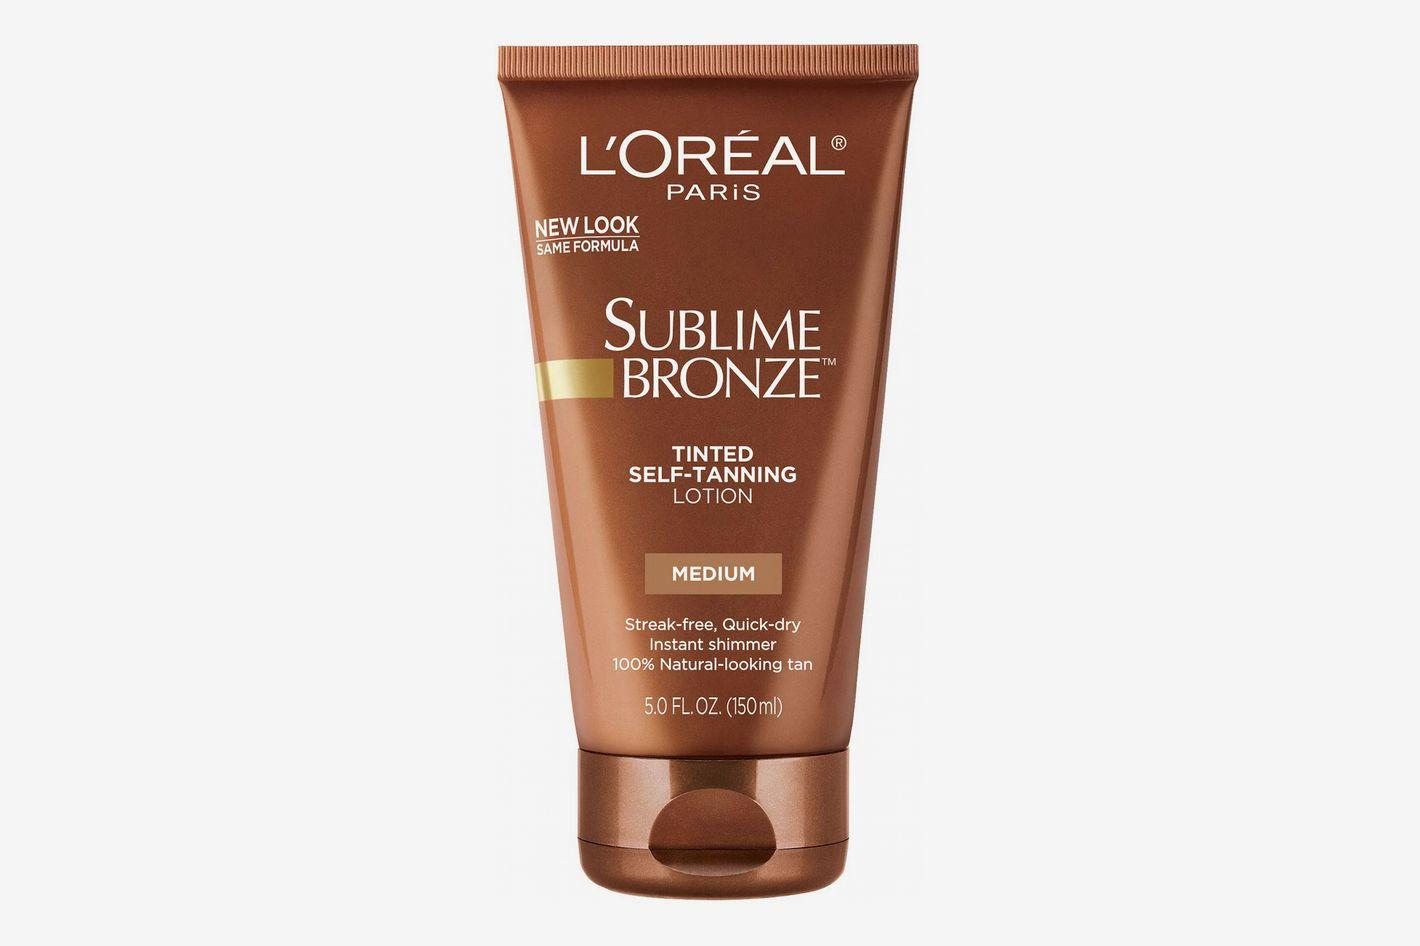 L'Oreal Paris Sublime Bronze Tinted Self-Tanning Lotion Medium Natural Tan